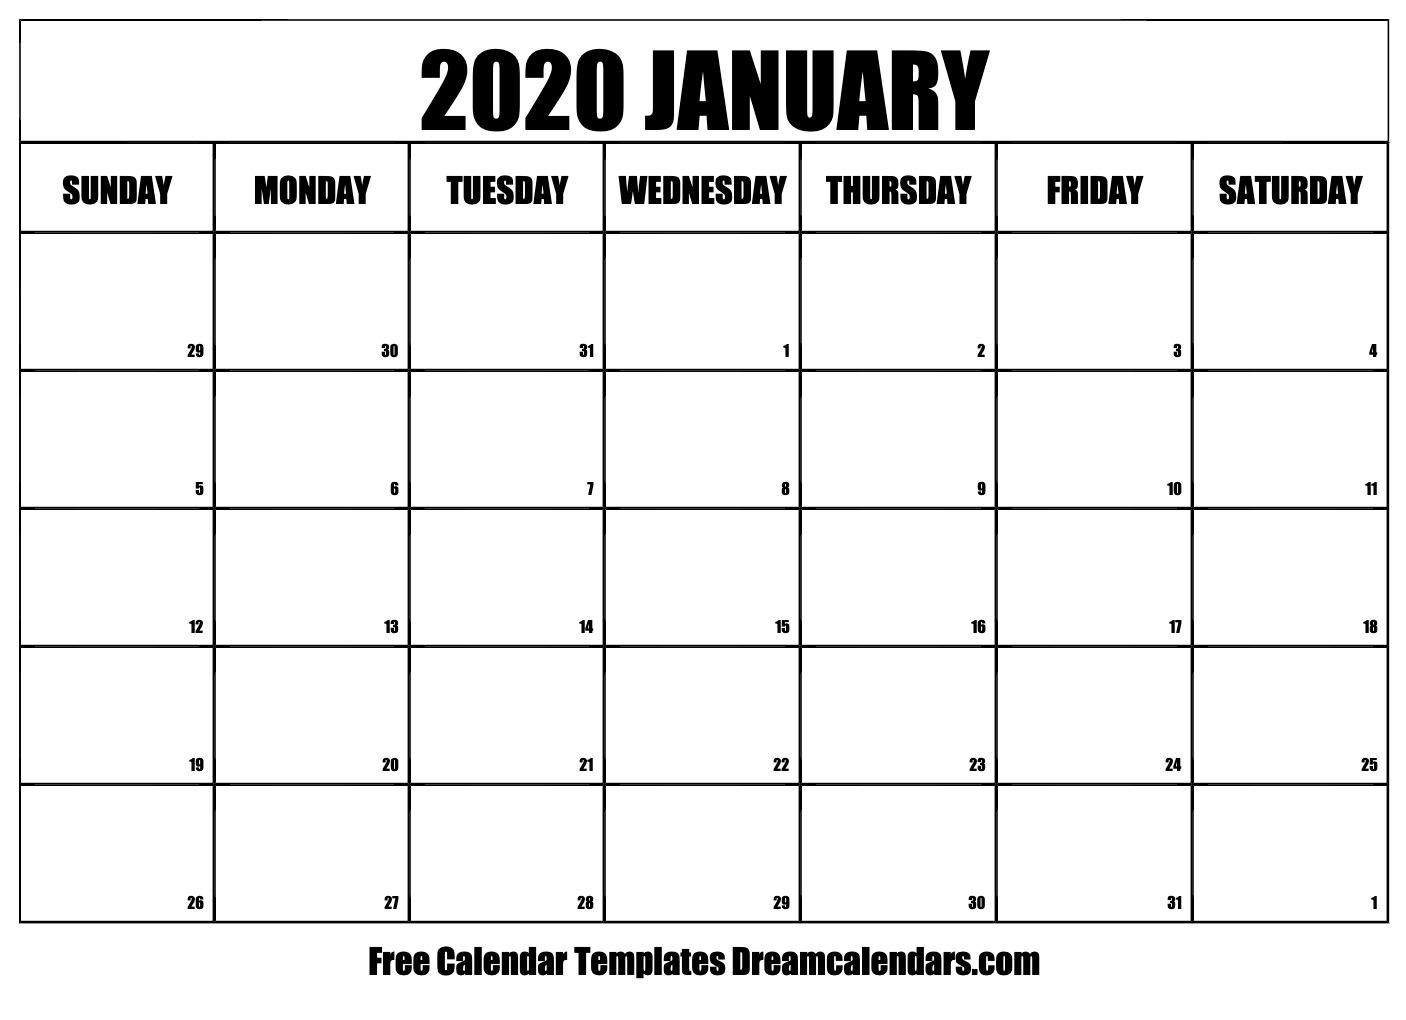 Printable January 2020 Calendar with regard to Free Printable 2020 Calendar To I Can Edit